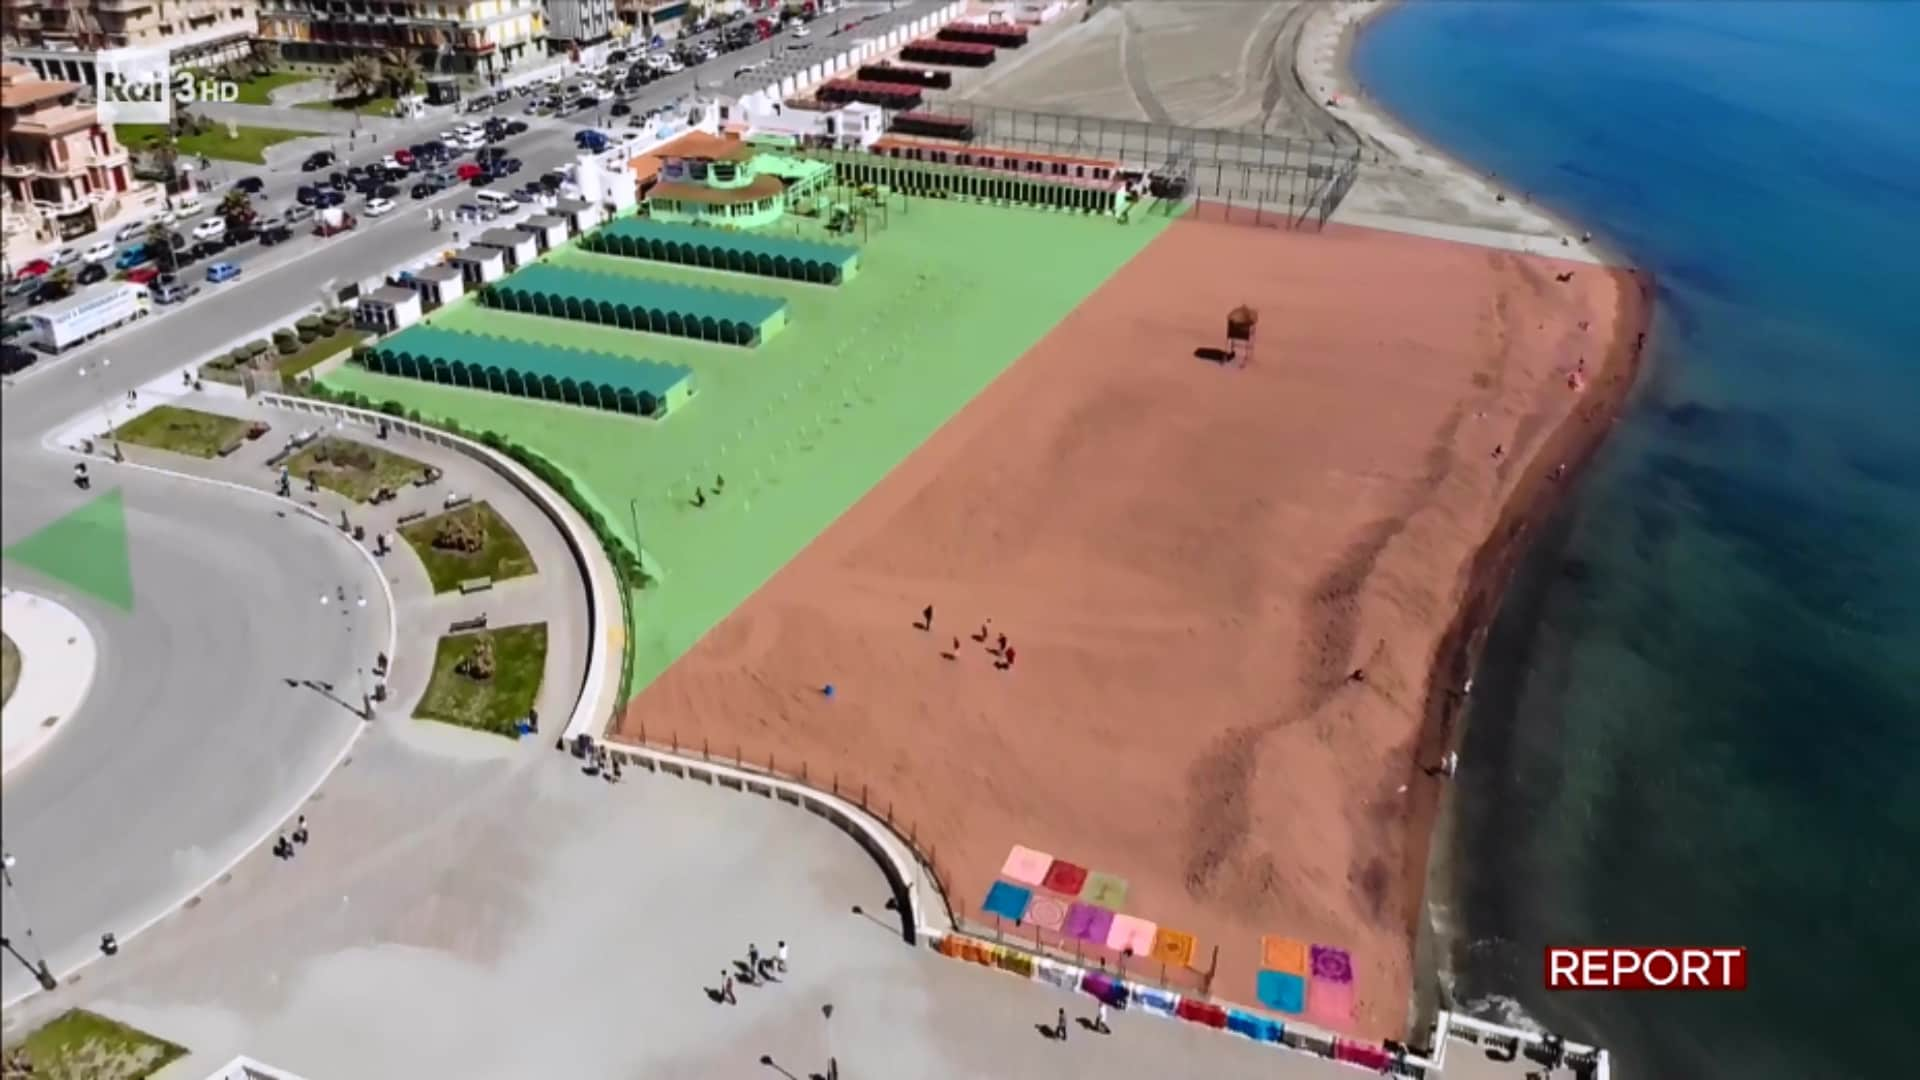 report ostia balneari libera spiaggia m5s paolo ferrara - 2